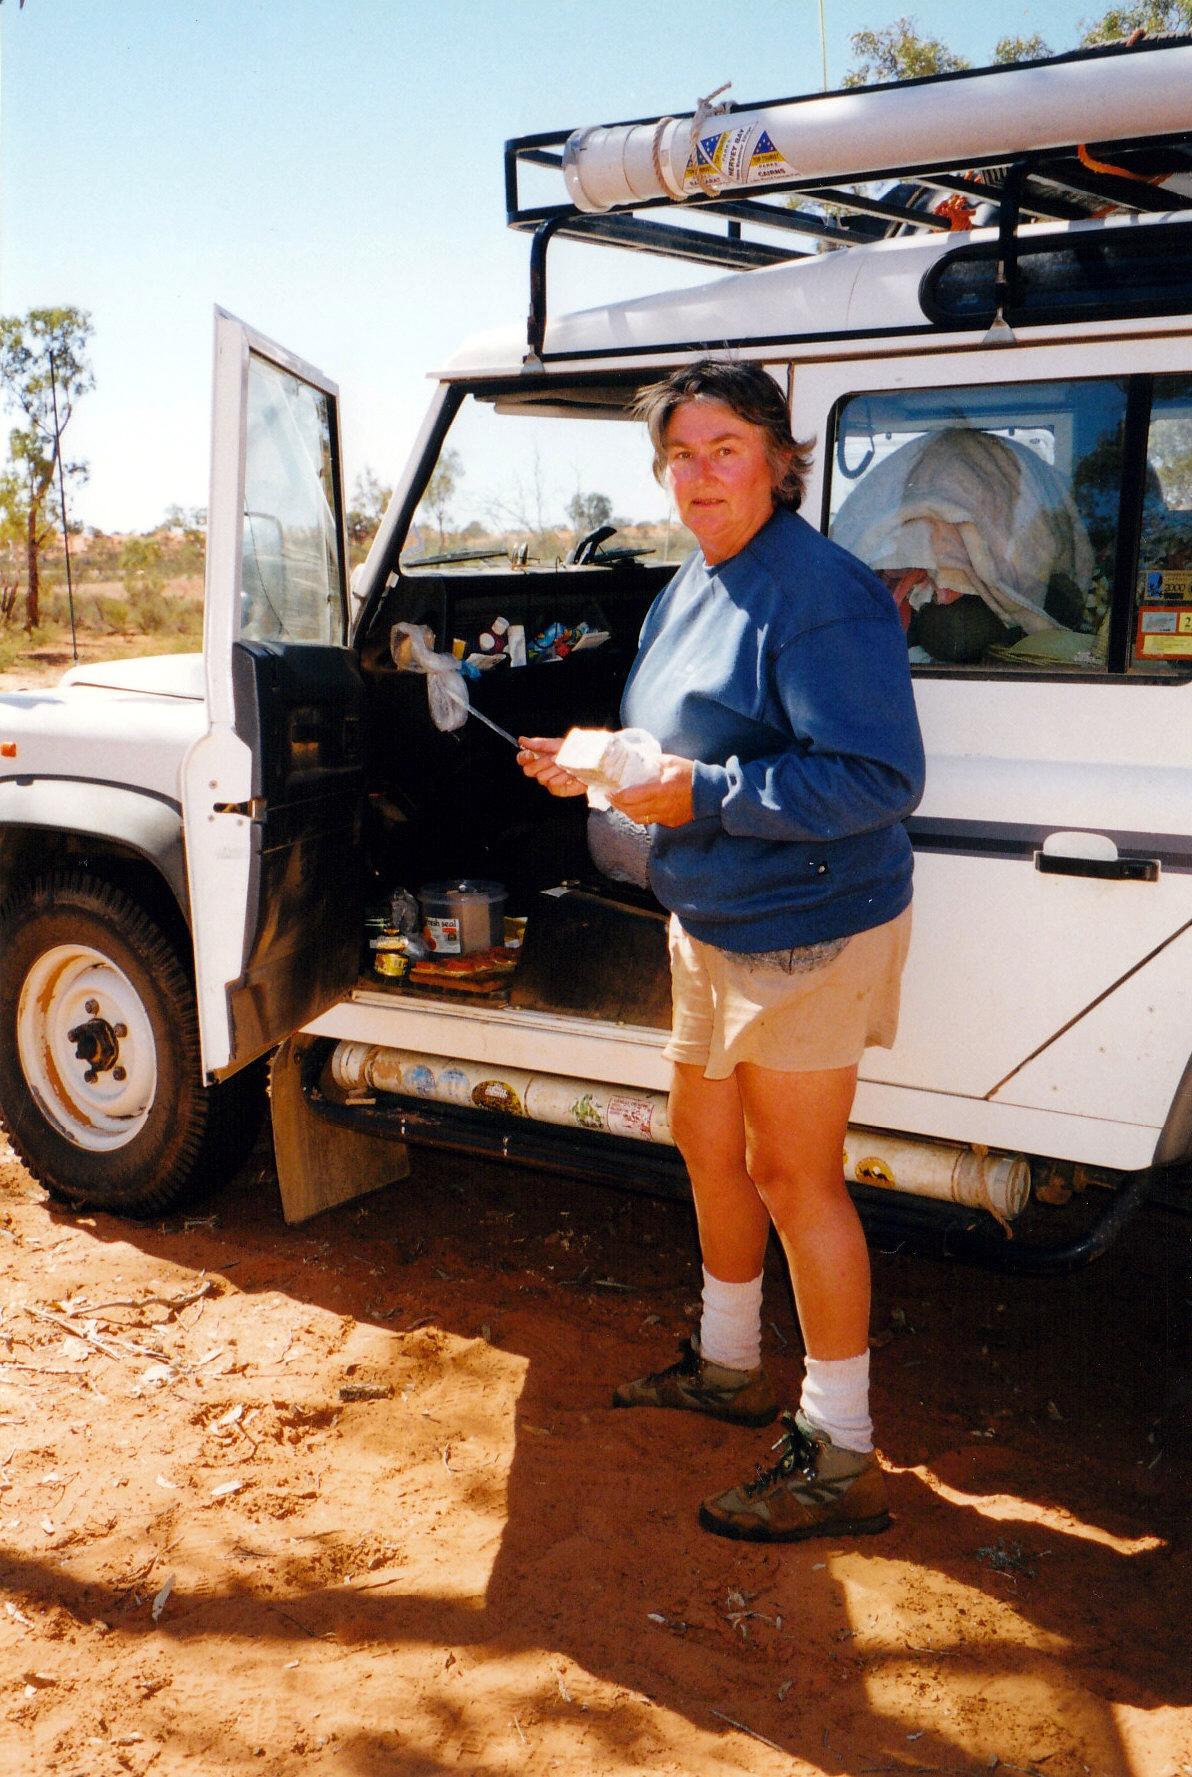 08-13-1999 08  lunch by tk.jpg